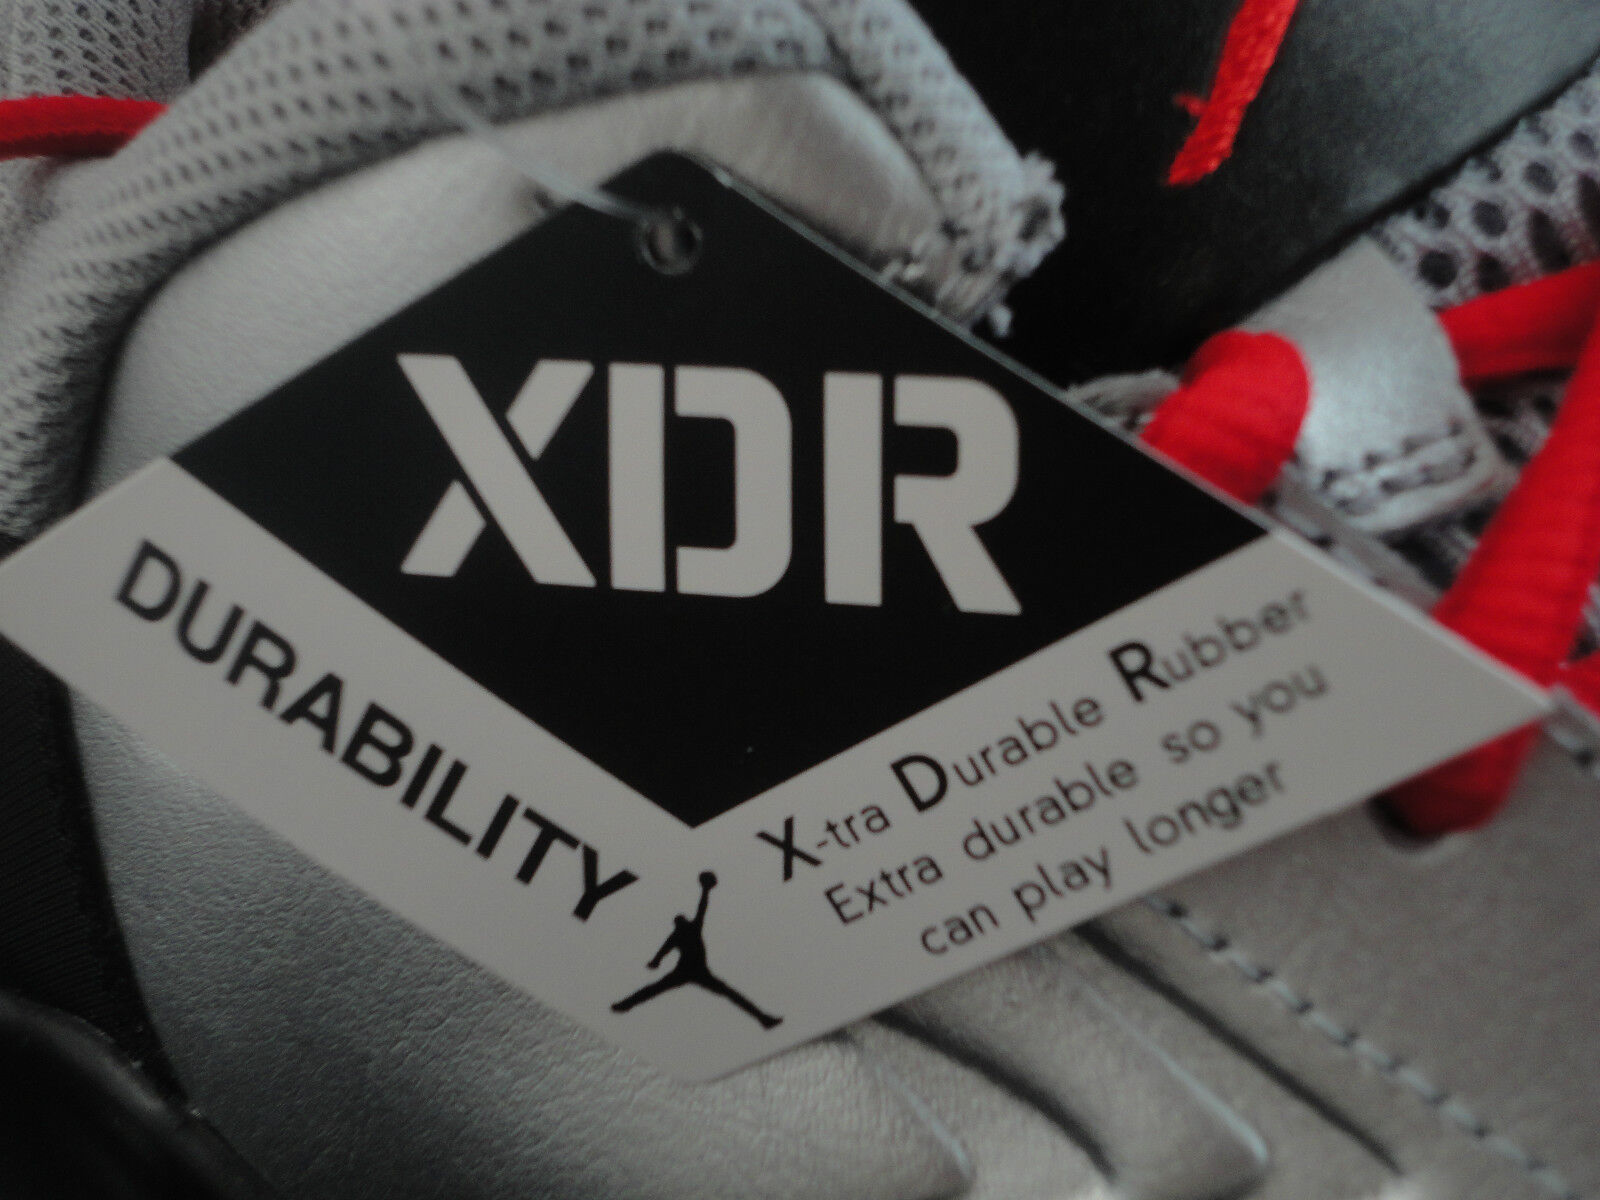 Nike Jordan Ace 23, XDR Size 12.5 Kilroy color Metallic Silver Challenge Red Blk